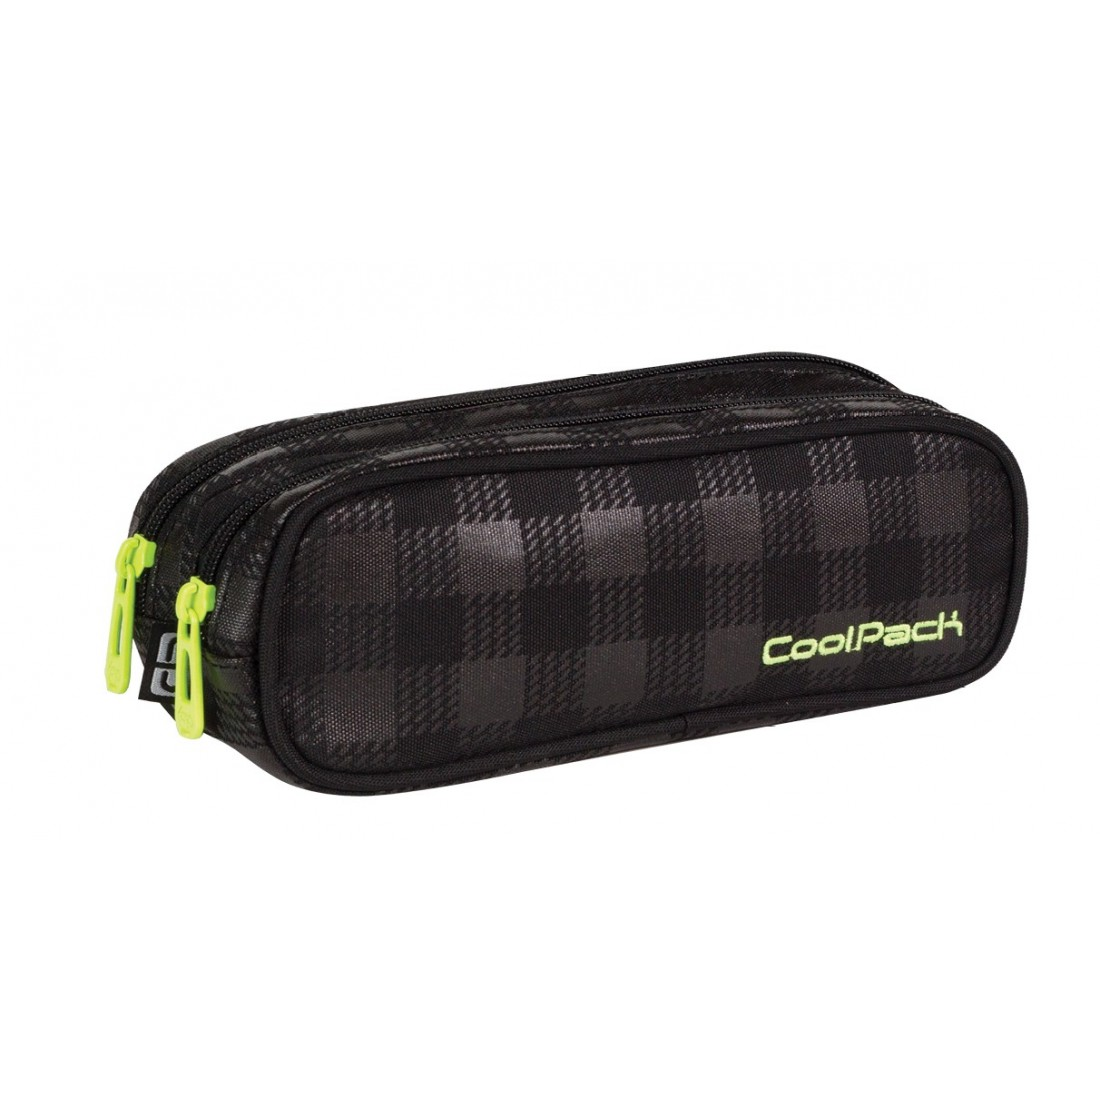 Saszetka podwójna CoolPack CLEVER BLACK & YELLOW CP 420